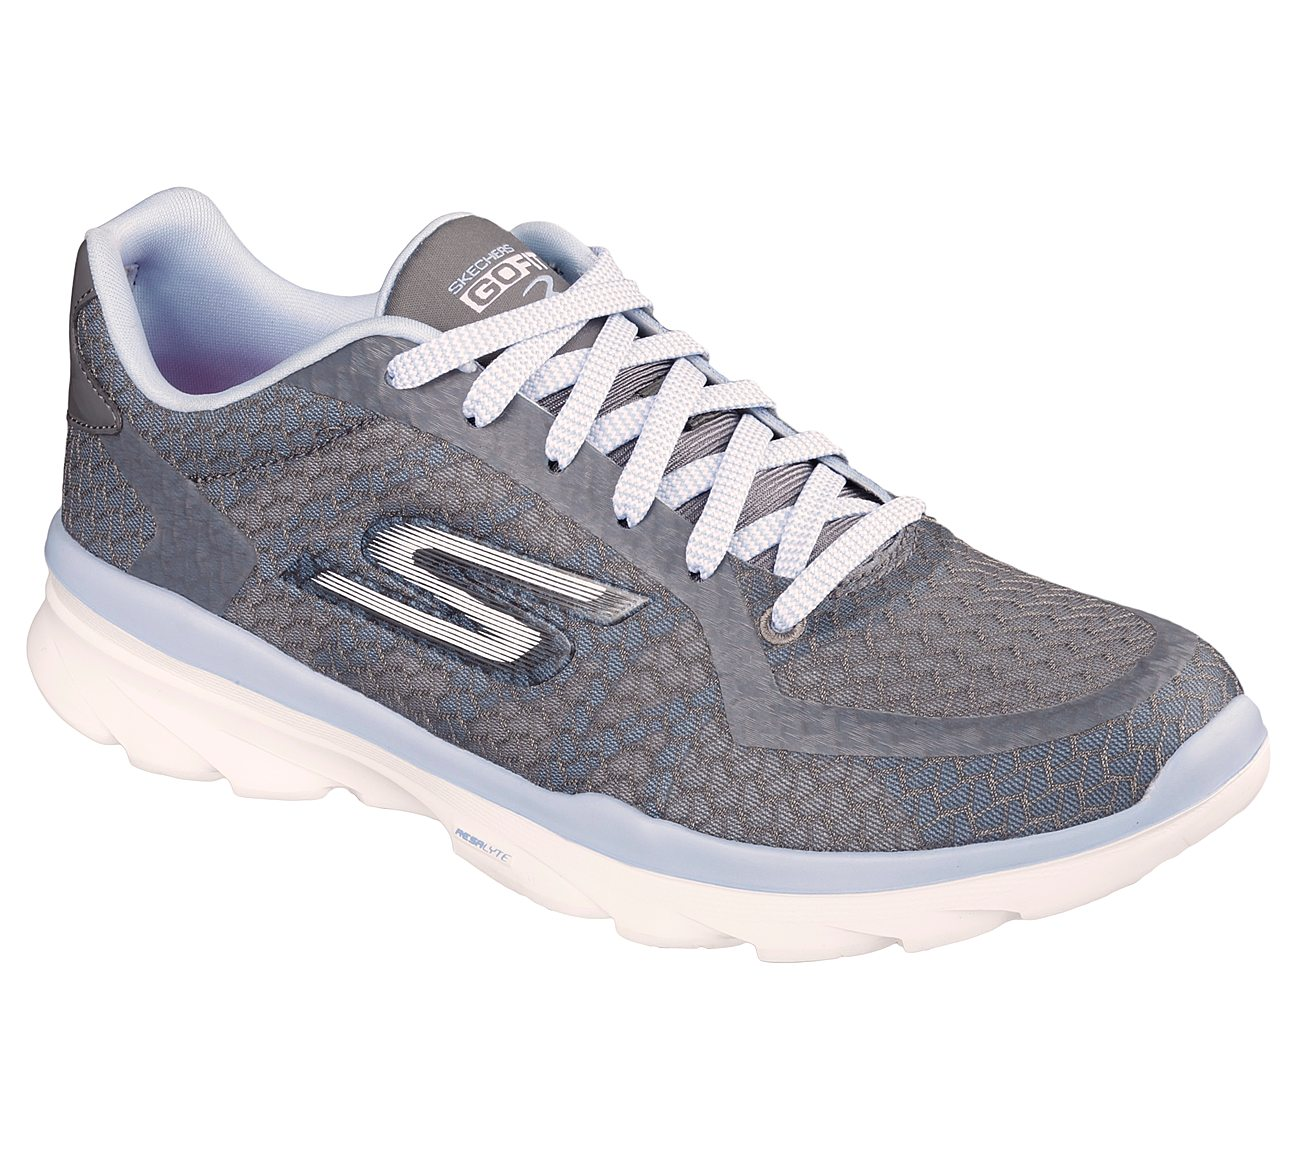 Skechers GOfit 3 Skechers Performance Shoes